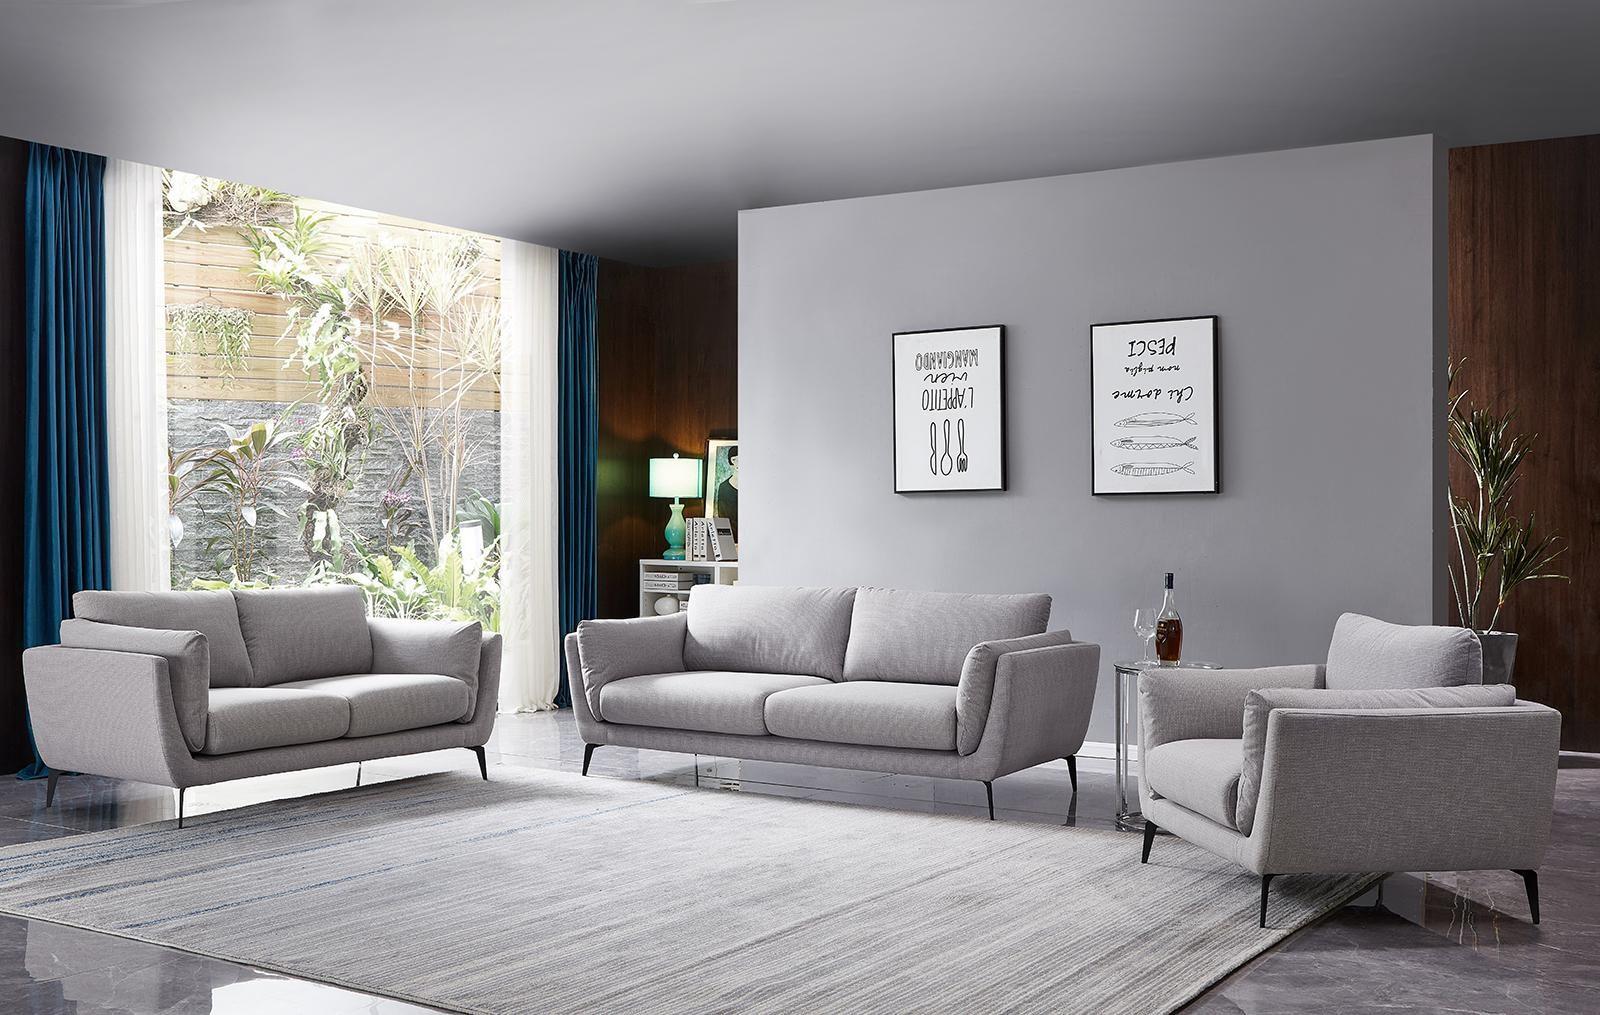 Набор мягкой мебели AMSTERDAM Серый Никель (LARKIN NWB NICKEL)